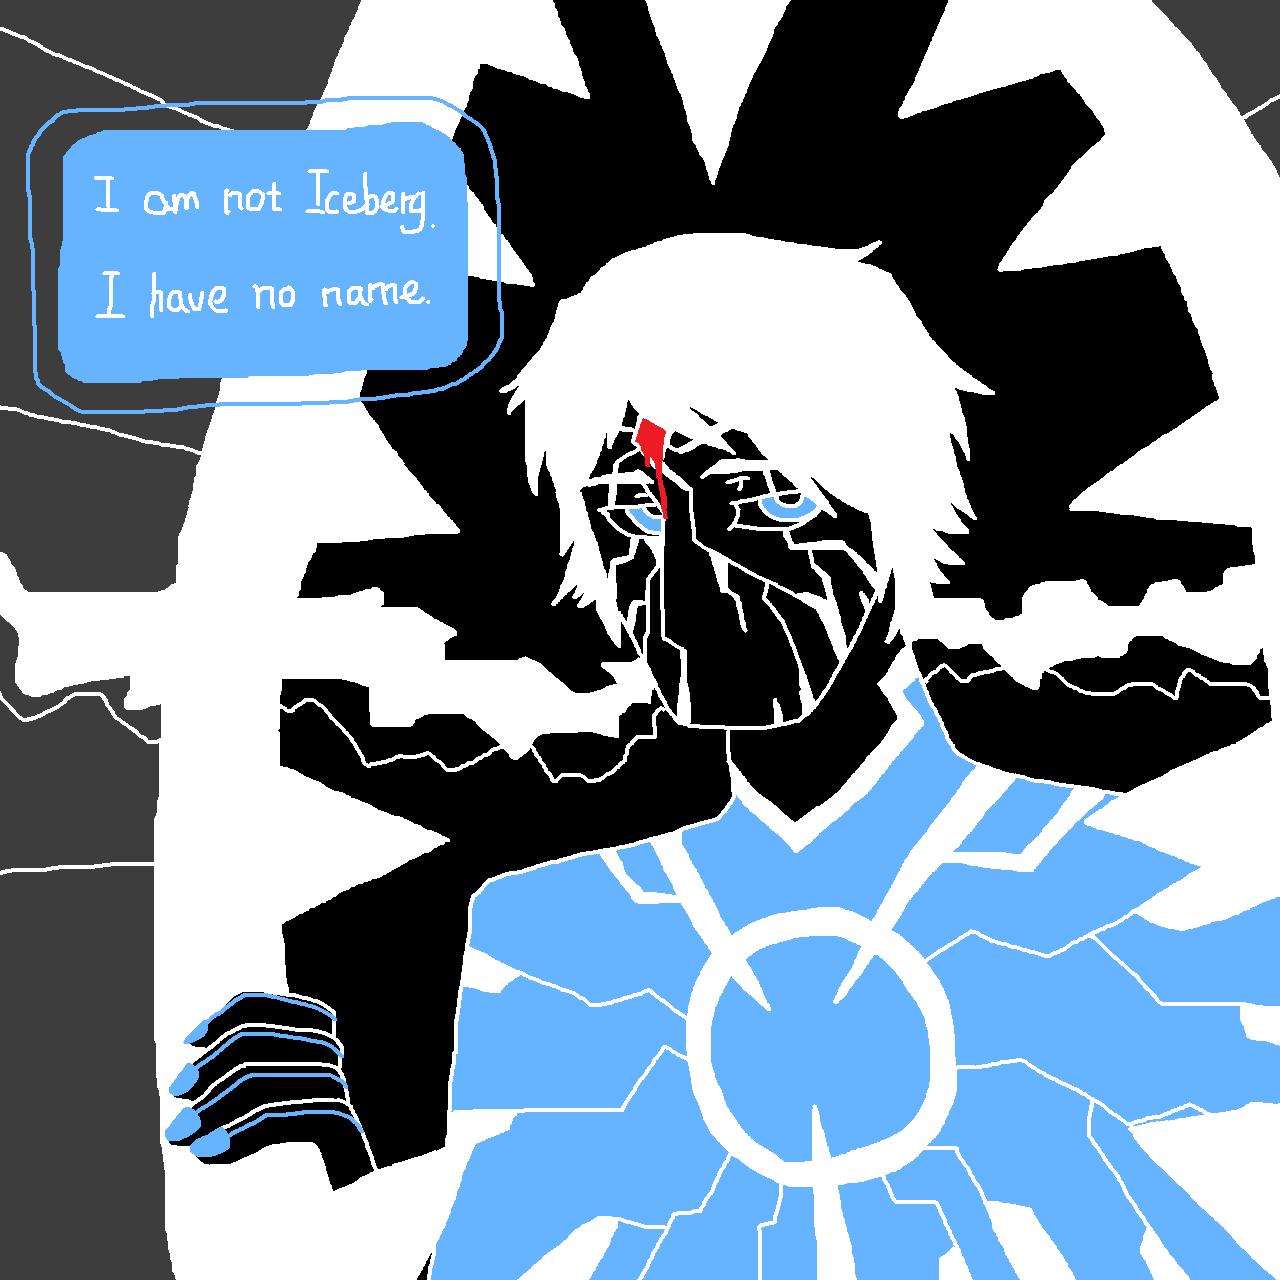 Dr. Iceberg - Calm (MS Paint)